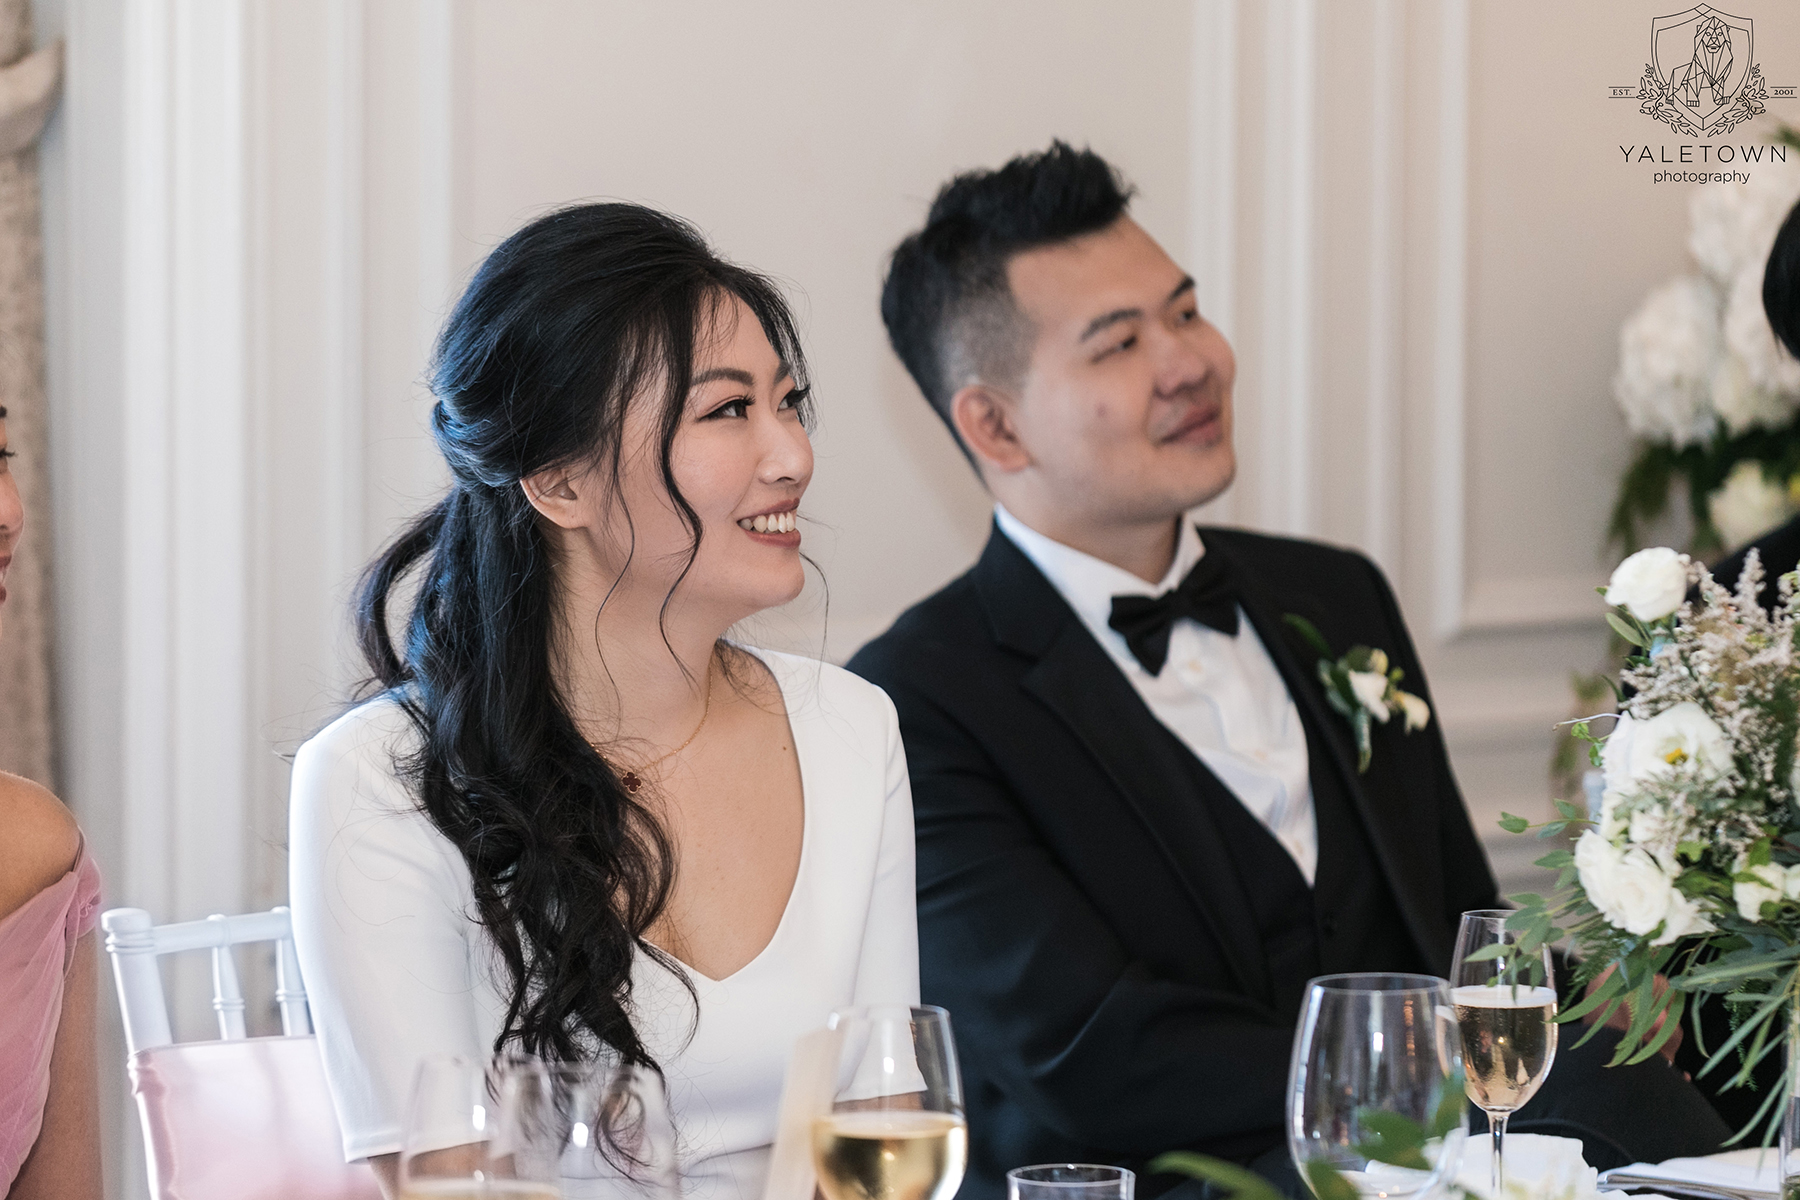 Wedding-Reception-Speeches-Bride-Groom-Rosewood-Hotel-Georgia-Vancouver-Wedding-Yaletown-Photography-photo